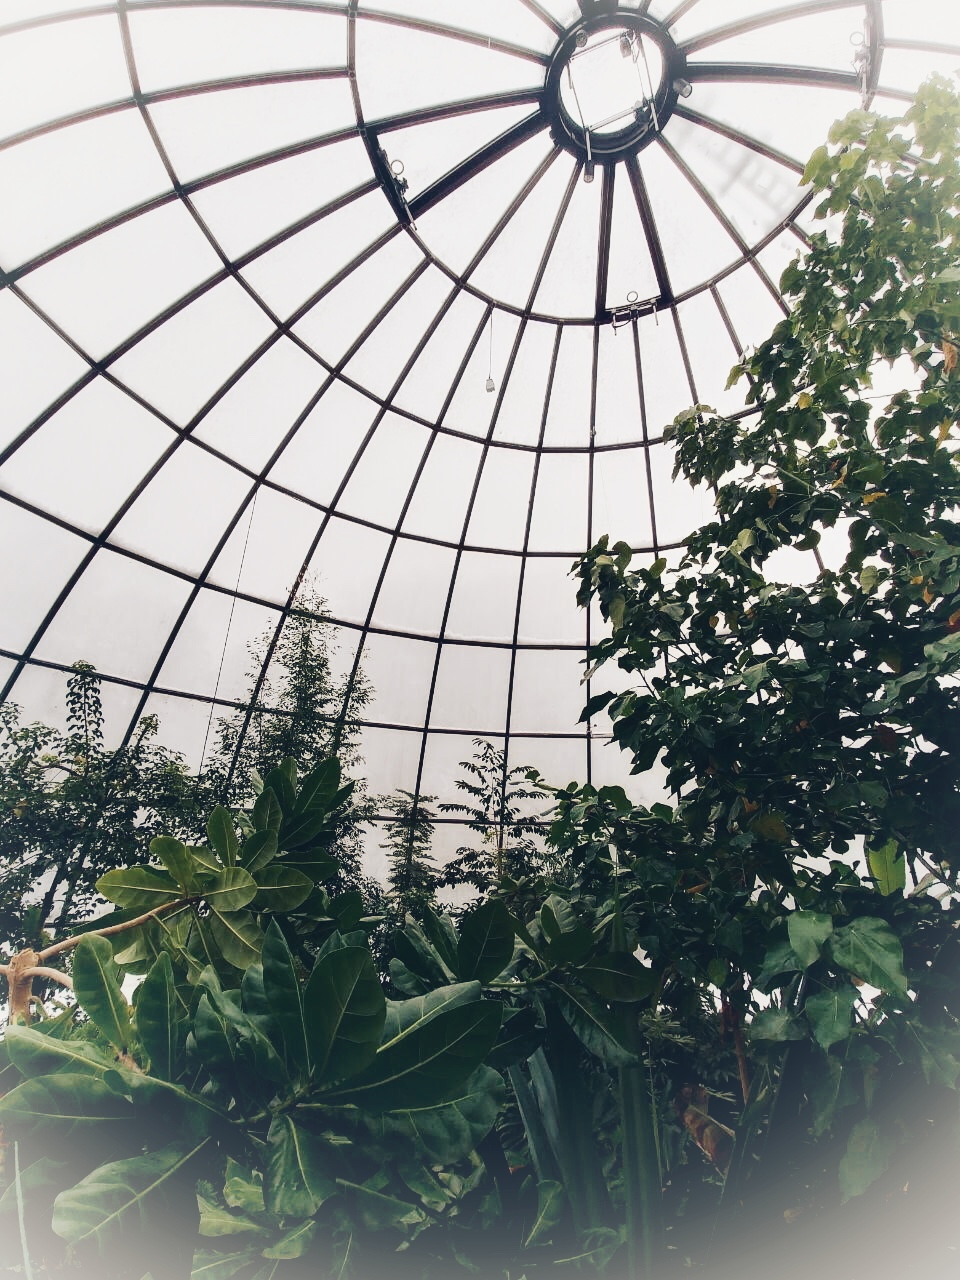 Šetnja kroz Botaničkubaštu